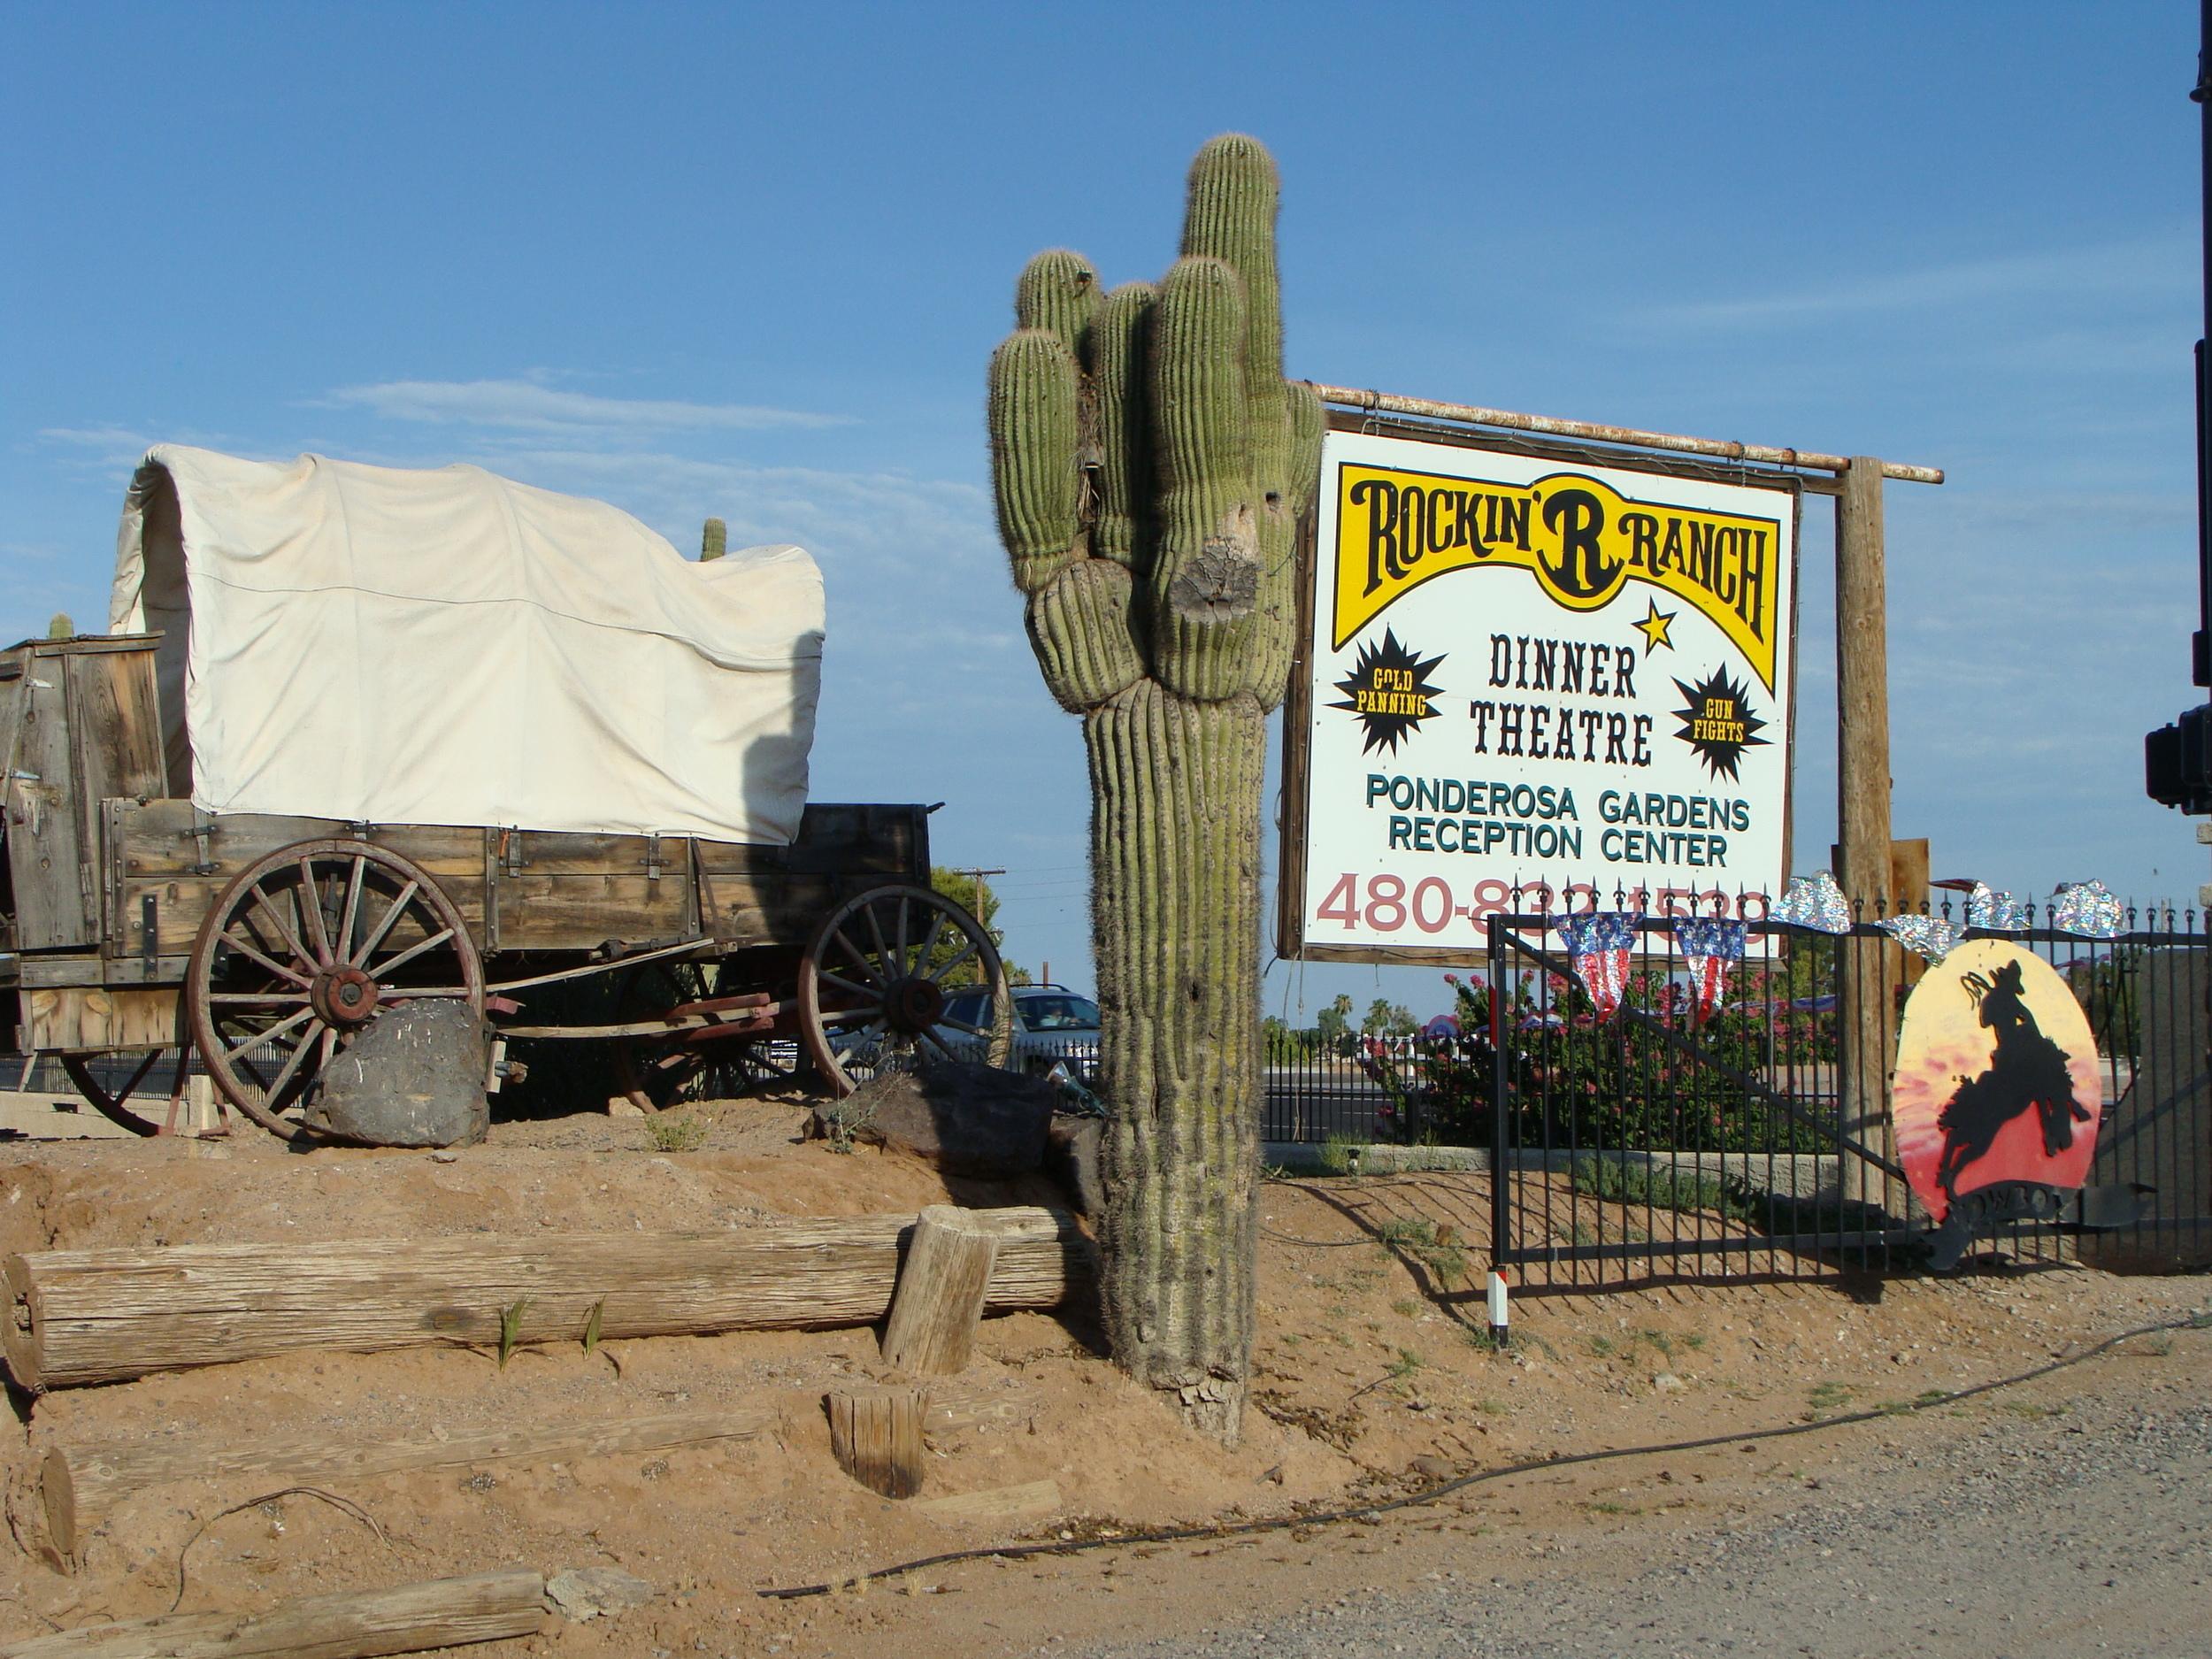 Rockin R Ranch Theatre - Large.JPG